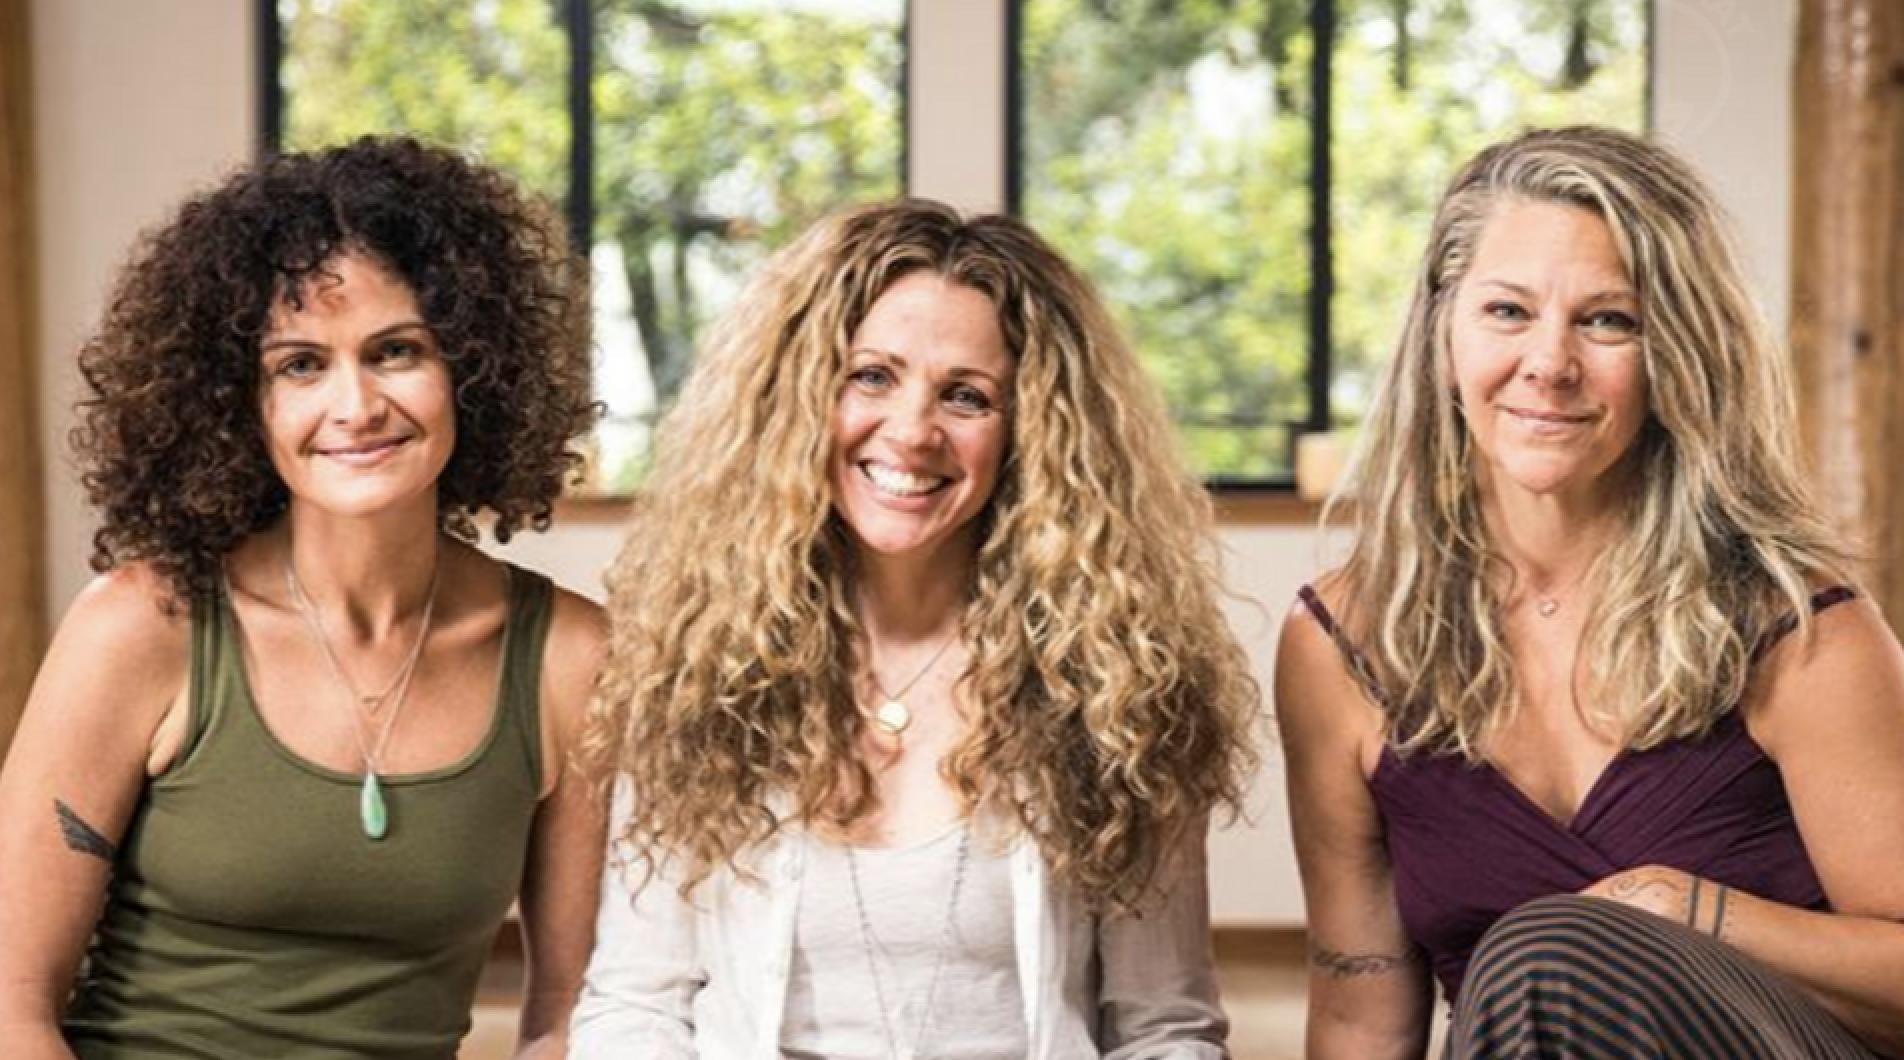 Seane Corn, Hala Khouri & Suzanne Sterling